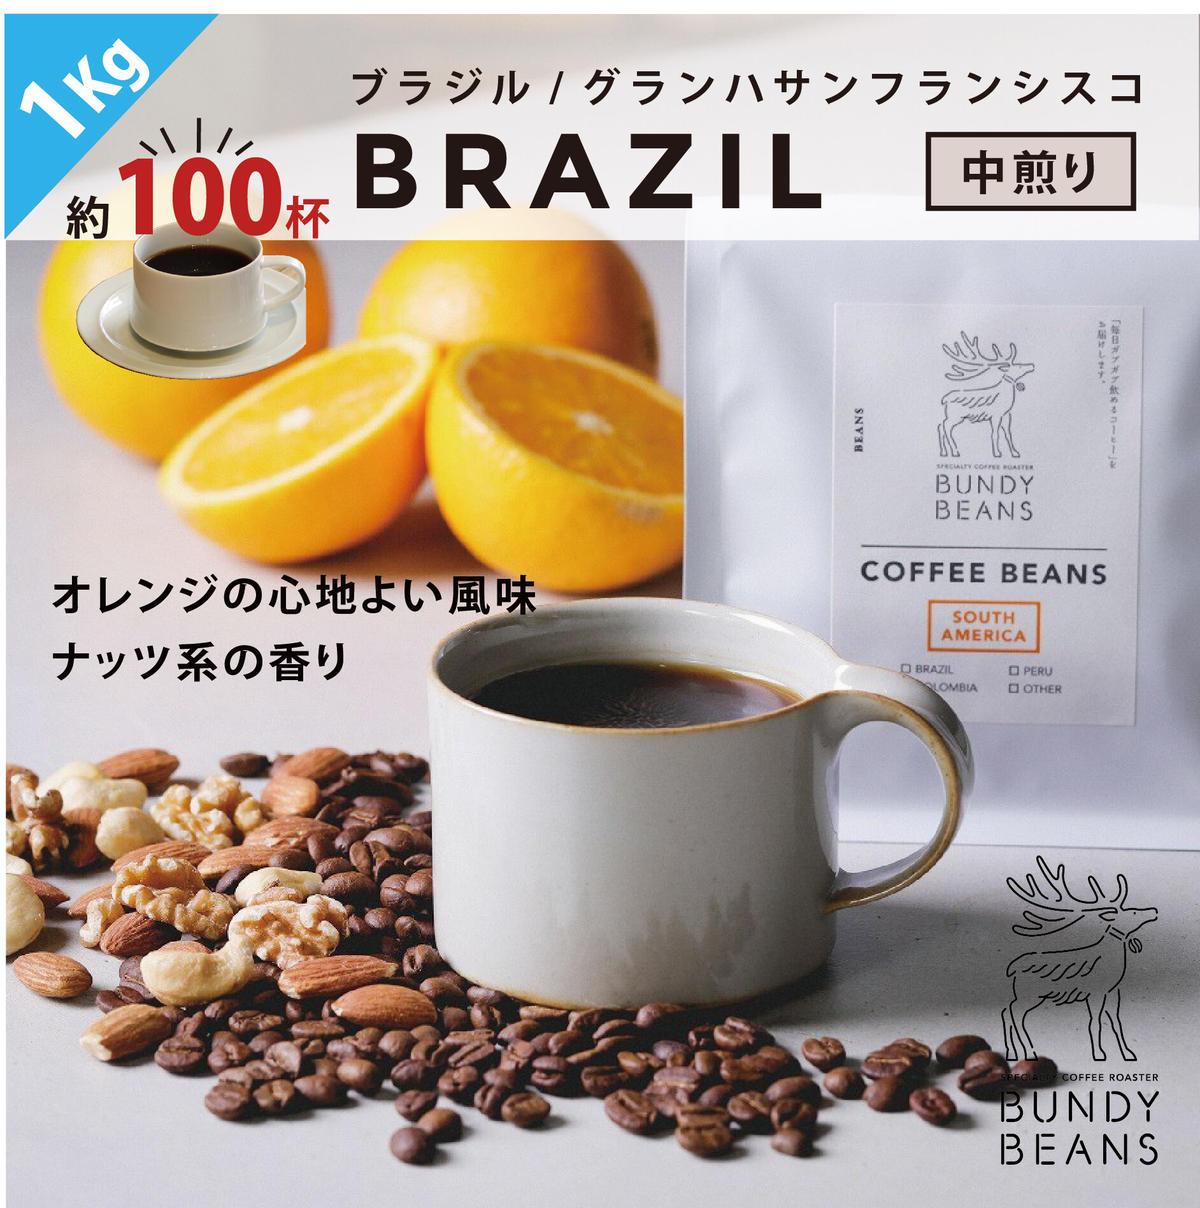 1Kg【ブラジル/BRAZIL】中煎り | BUNDYBEANS【公式オンラインショップ】